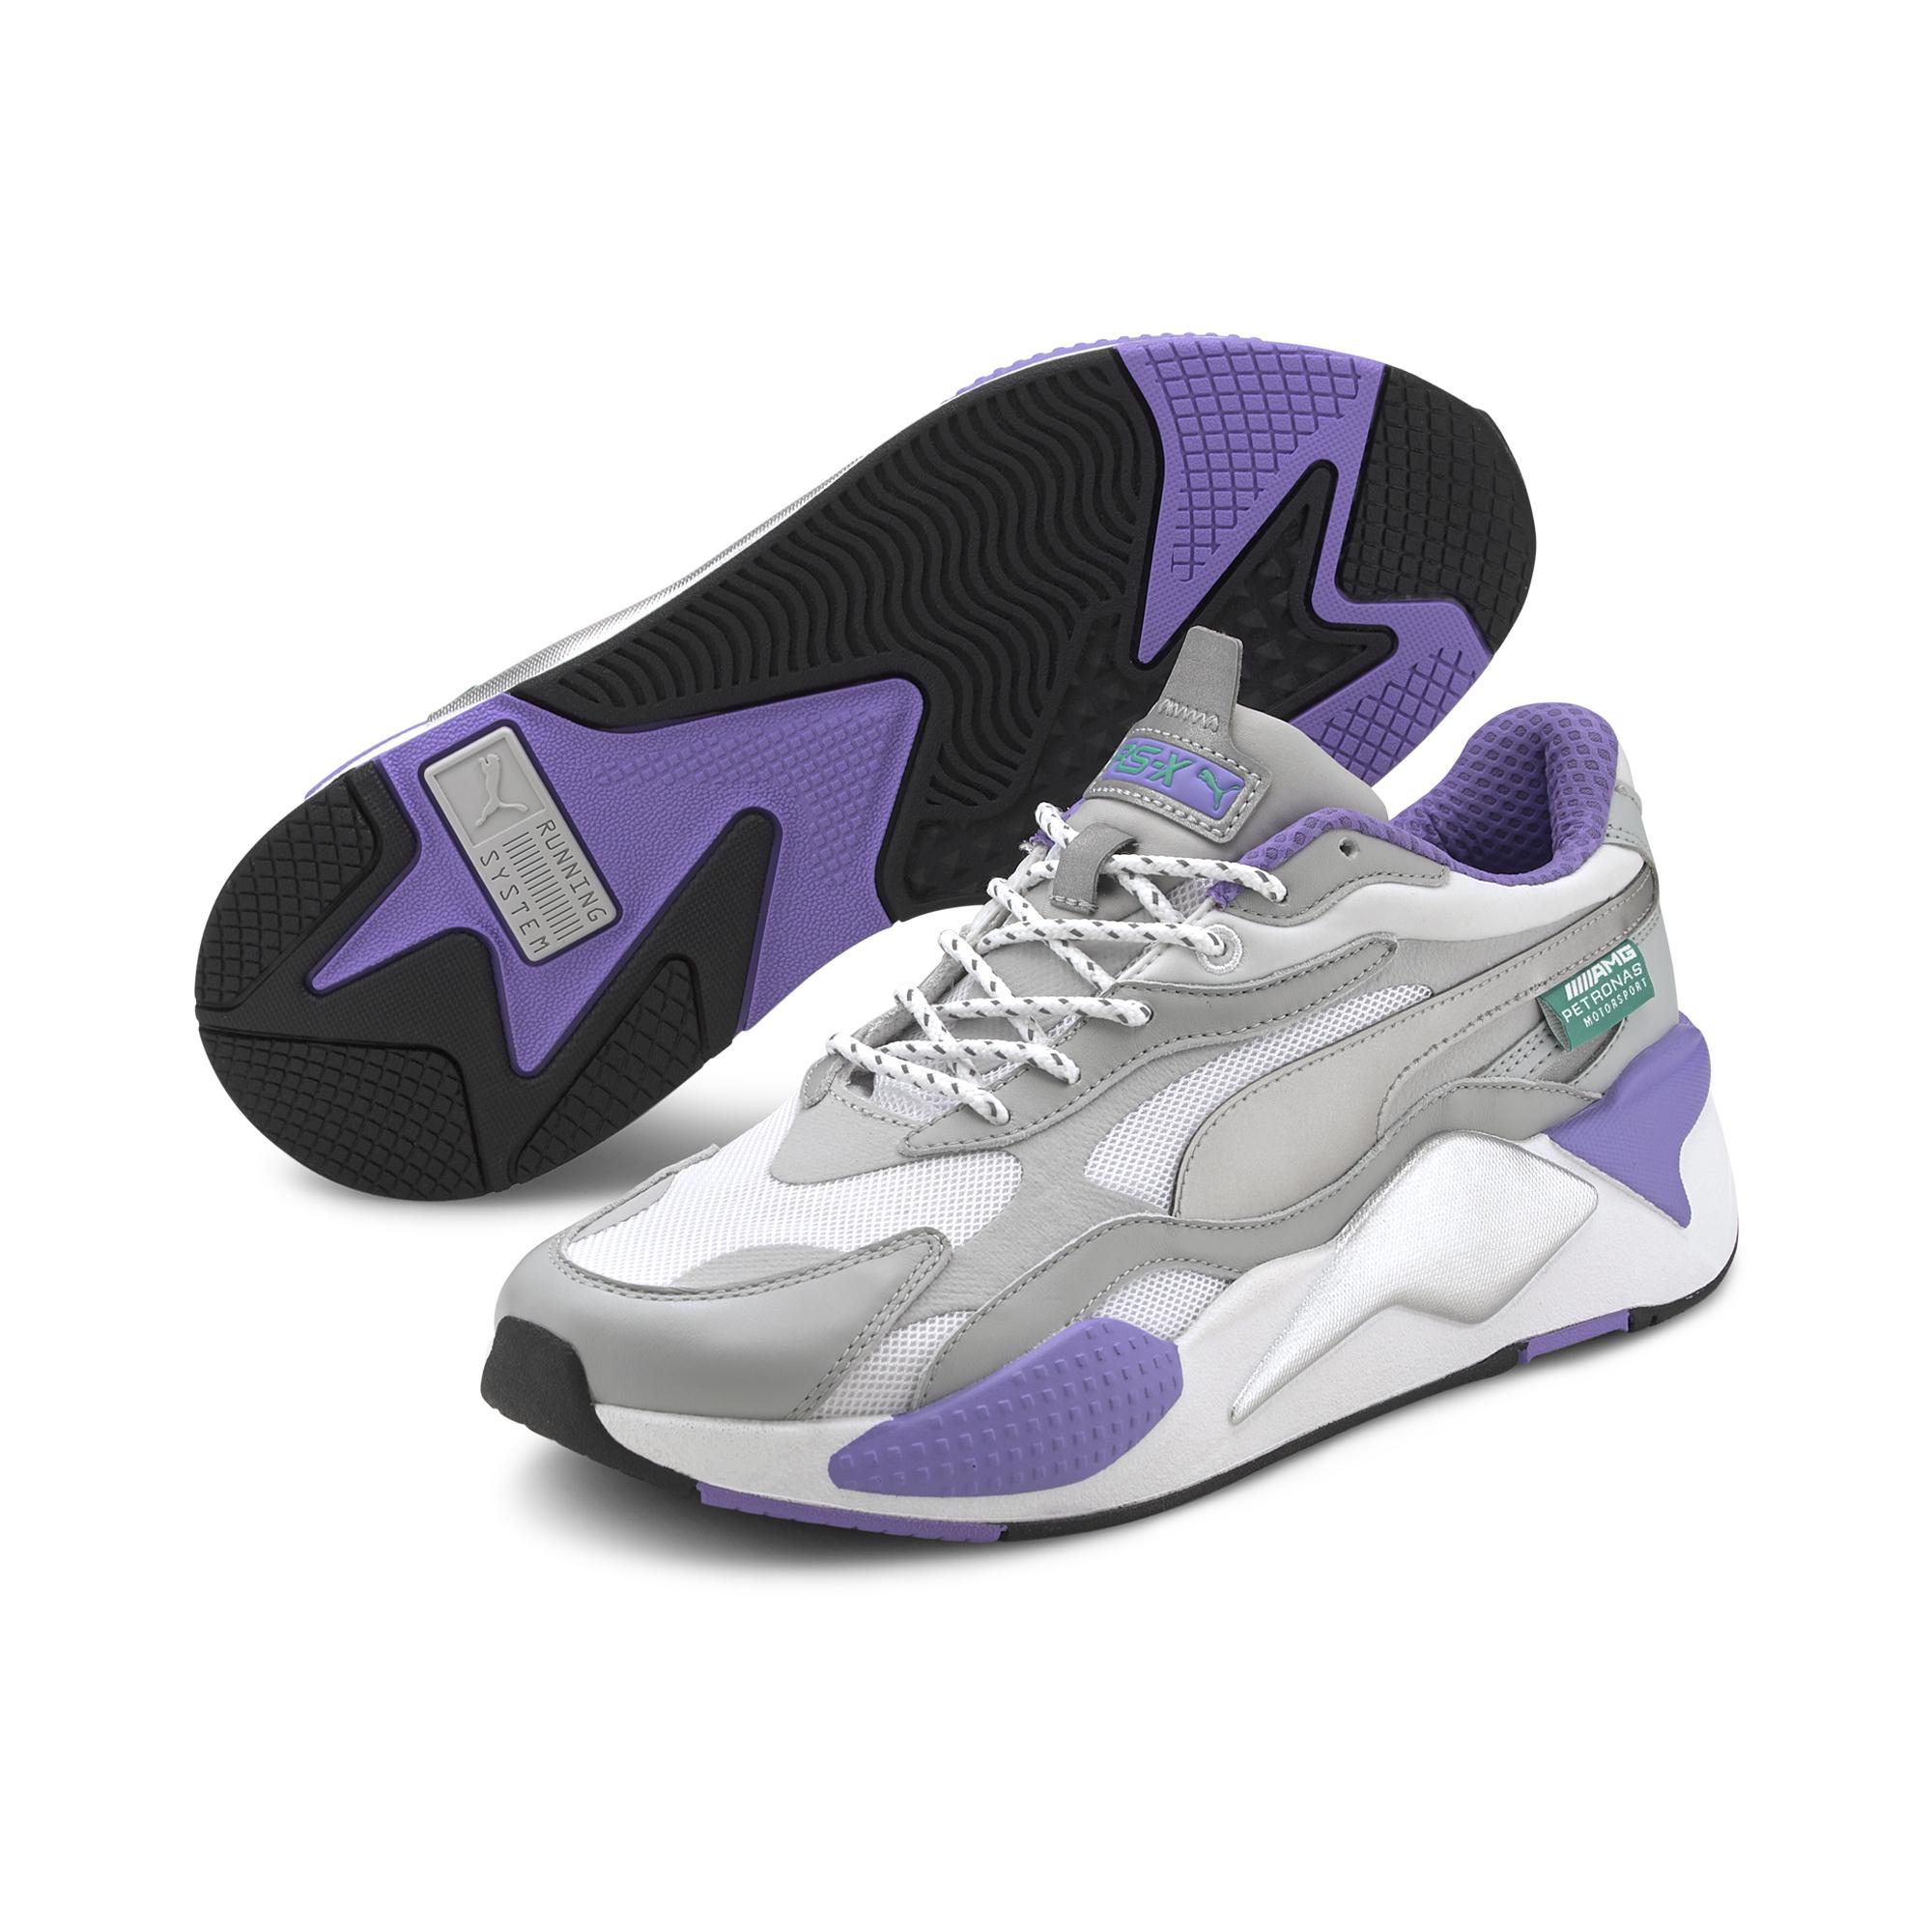 Puma MAPM RS-X³ Mrcds Tm Silver-White-Luminous Purple, Gray